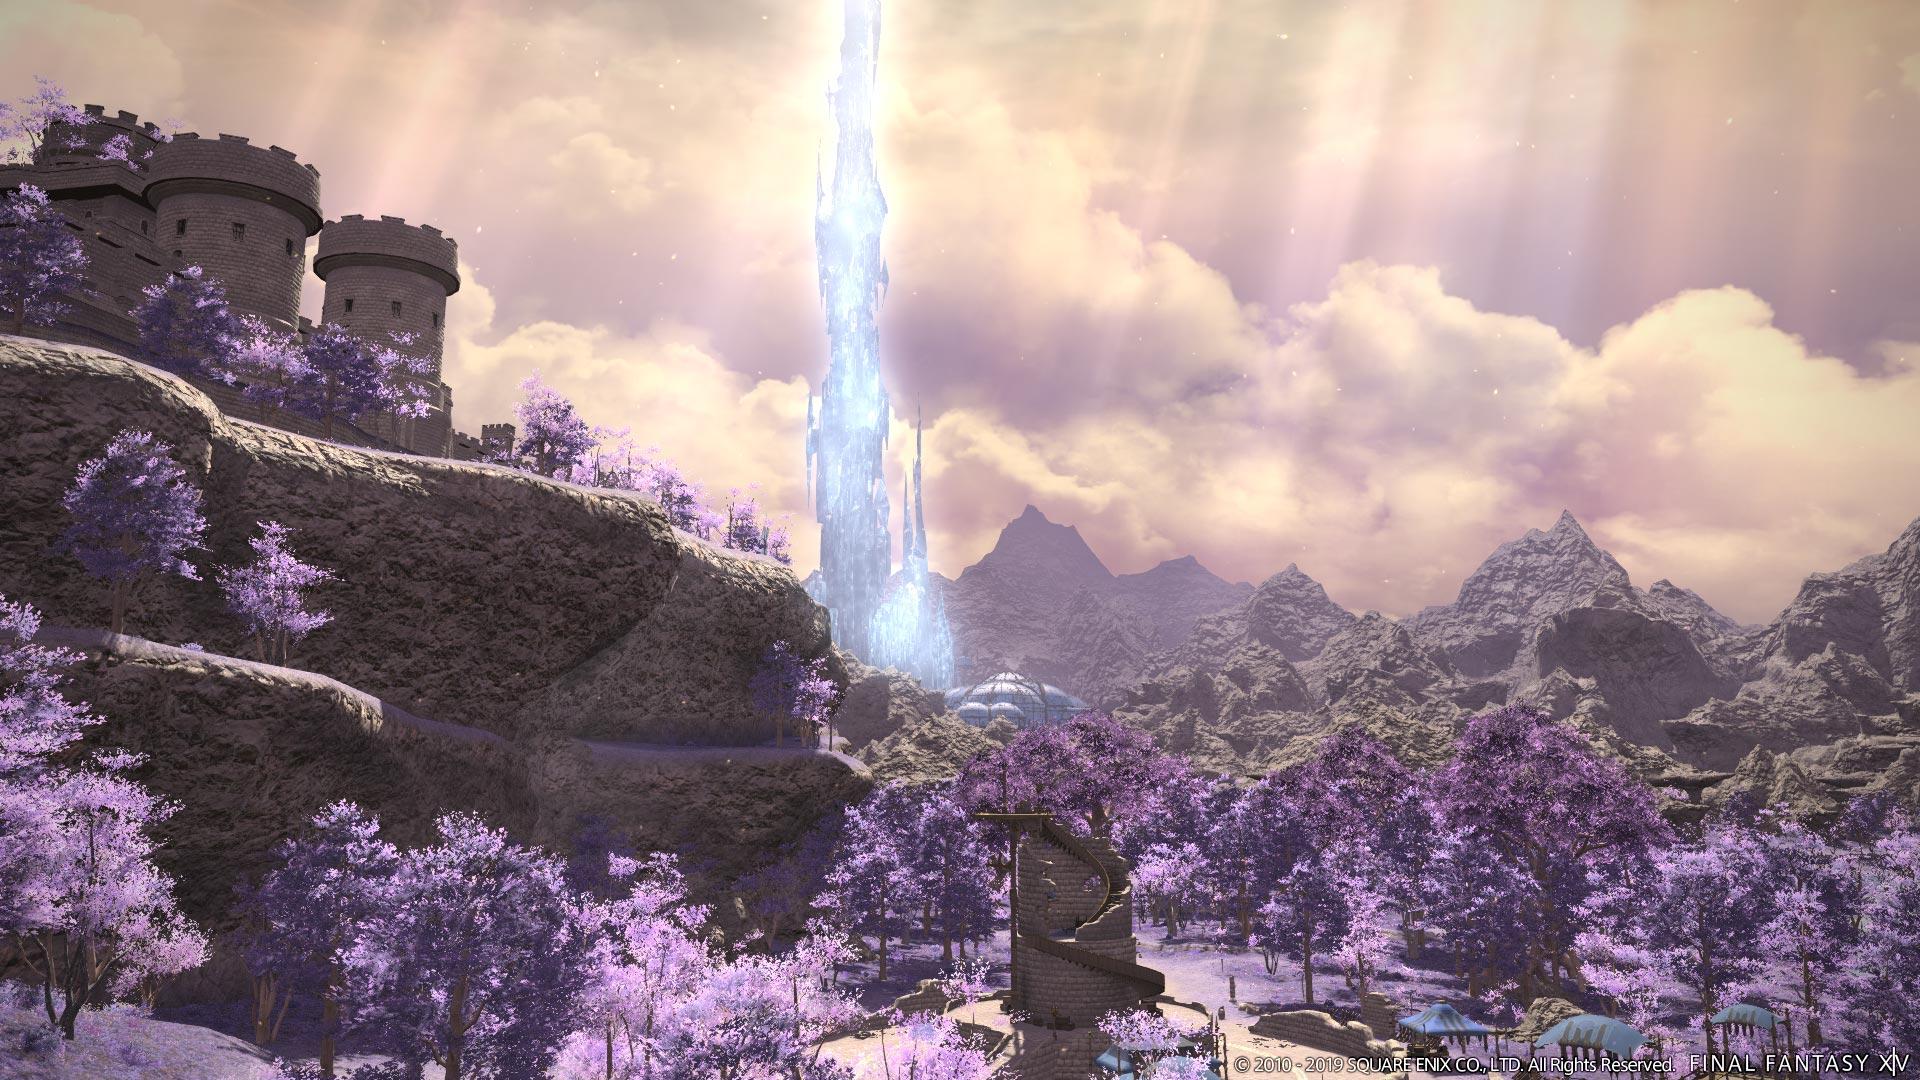 Final Fantasy XIV: Shadowbringers - Press Kit